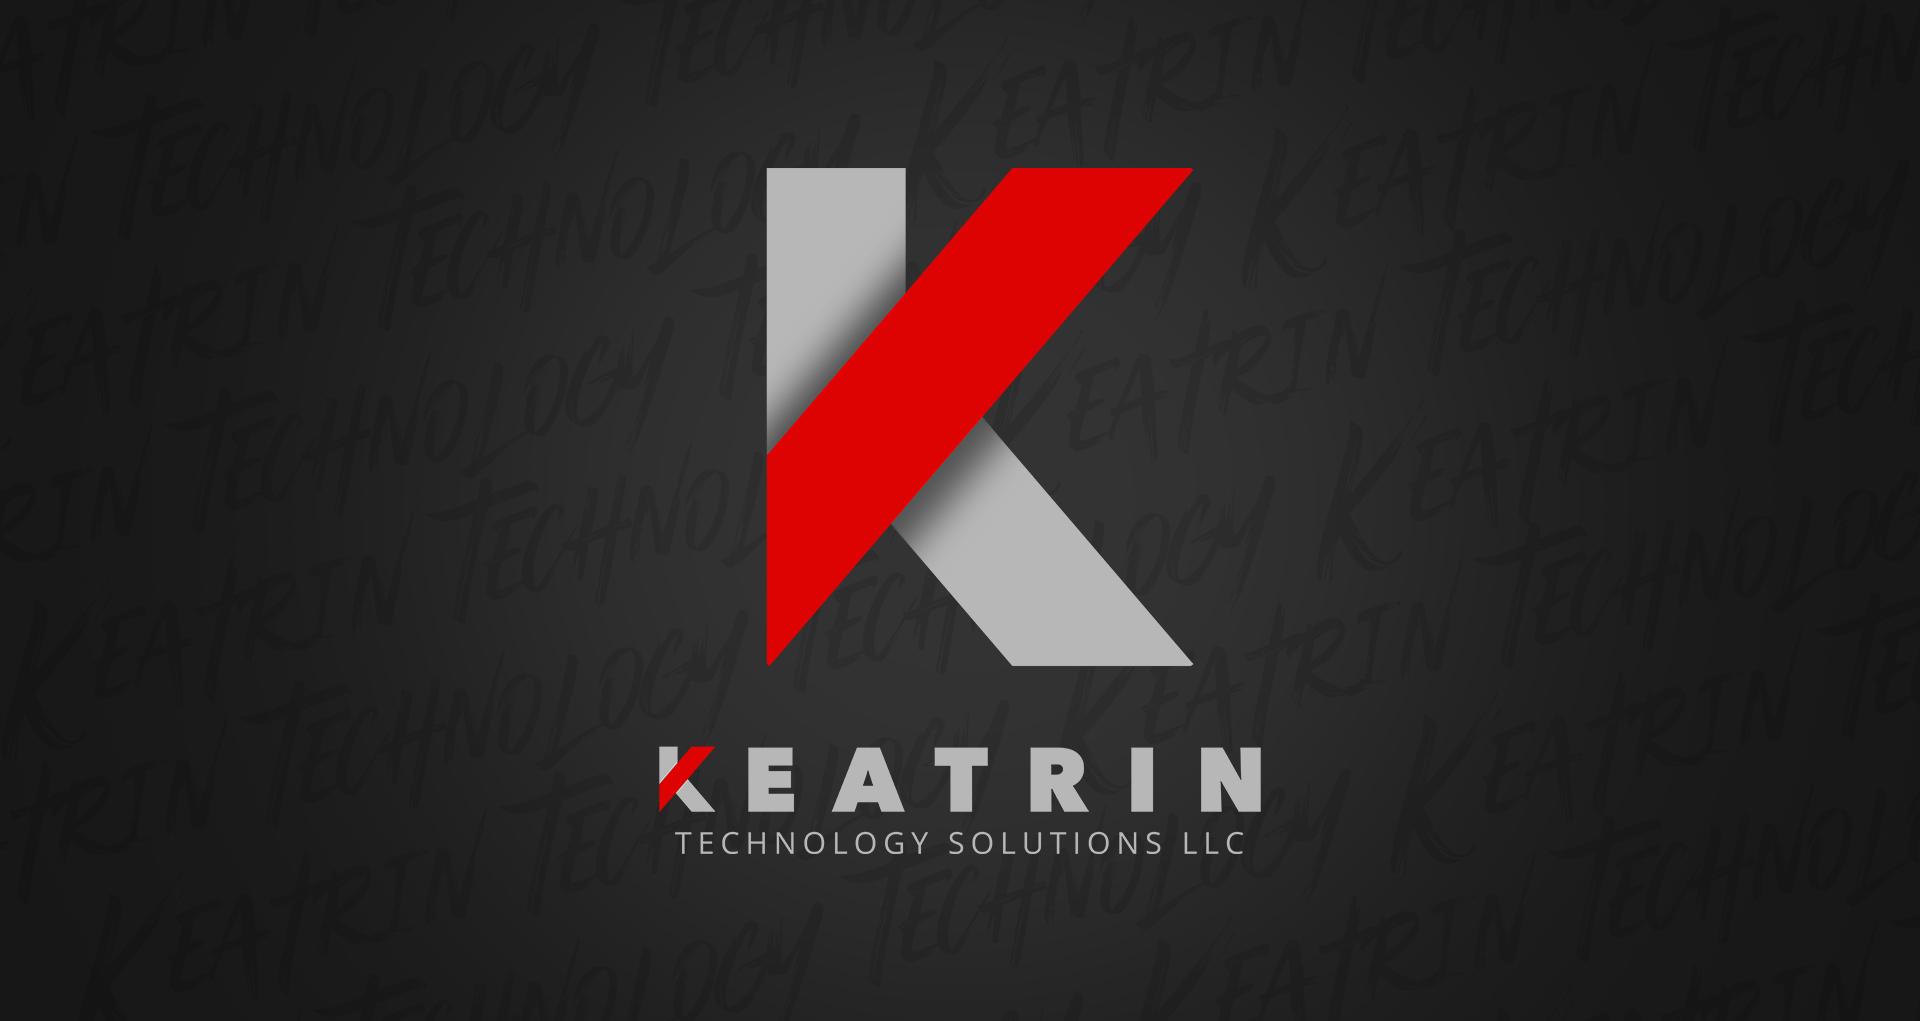 keatrin_technology_featured_image